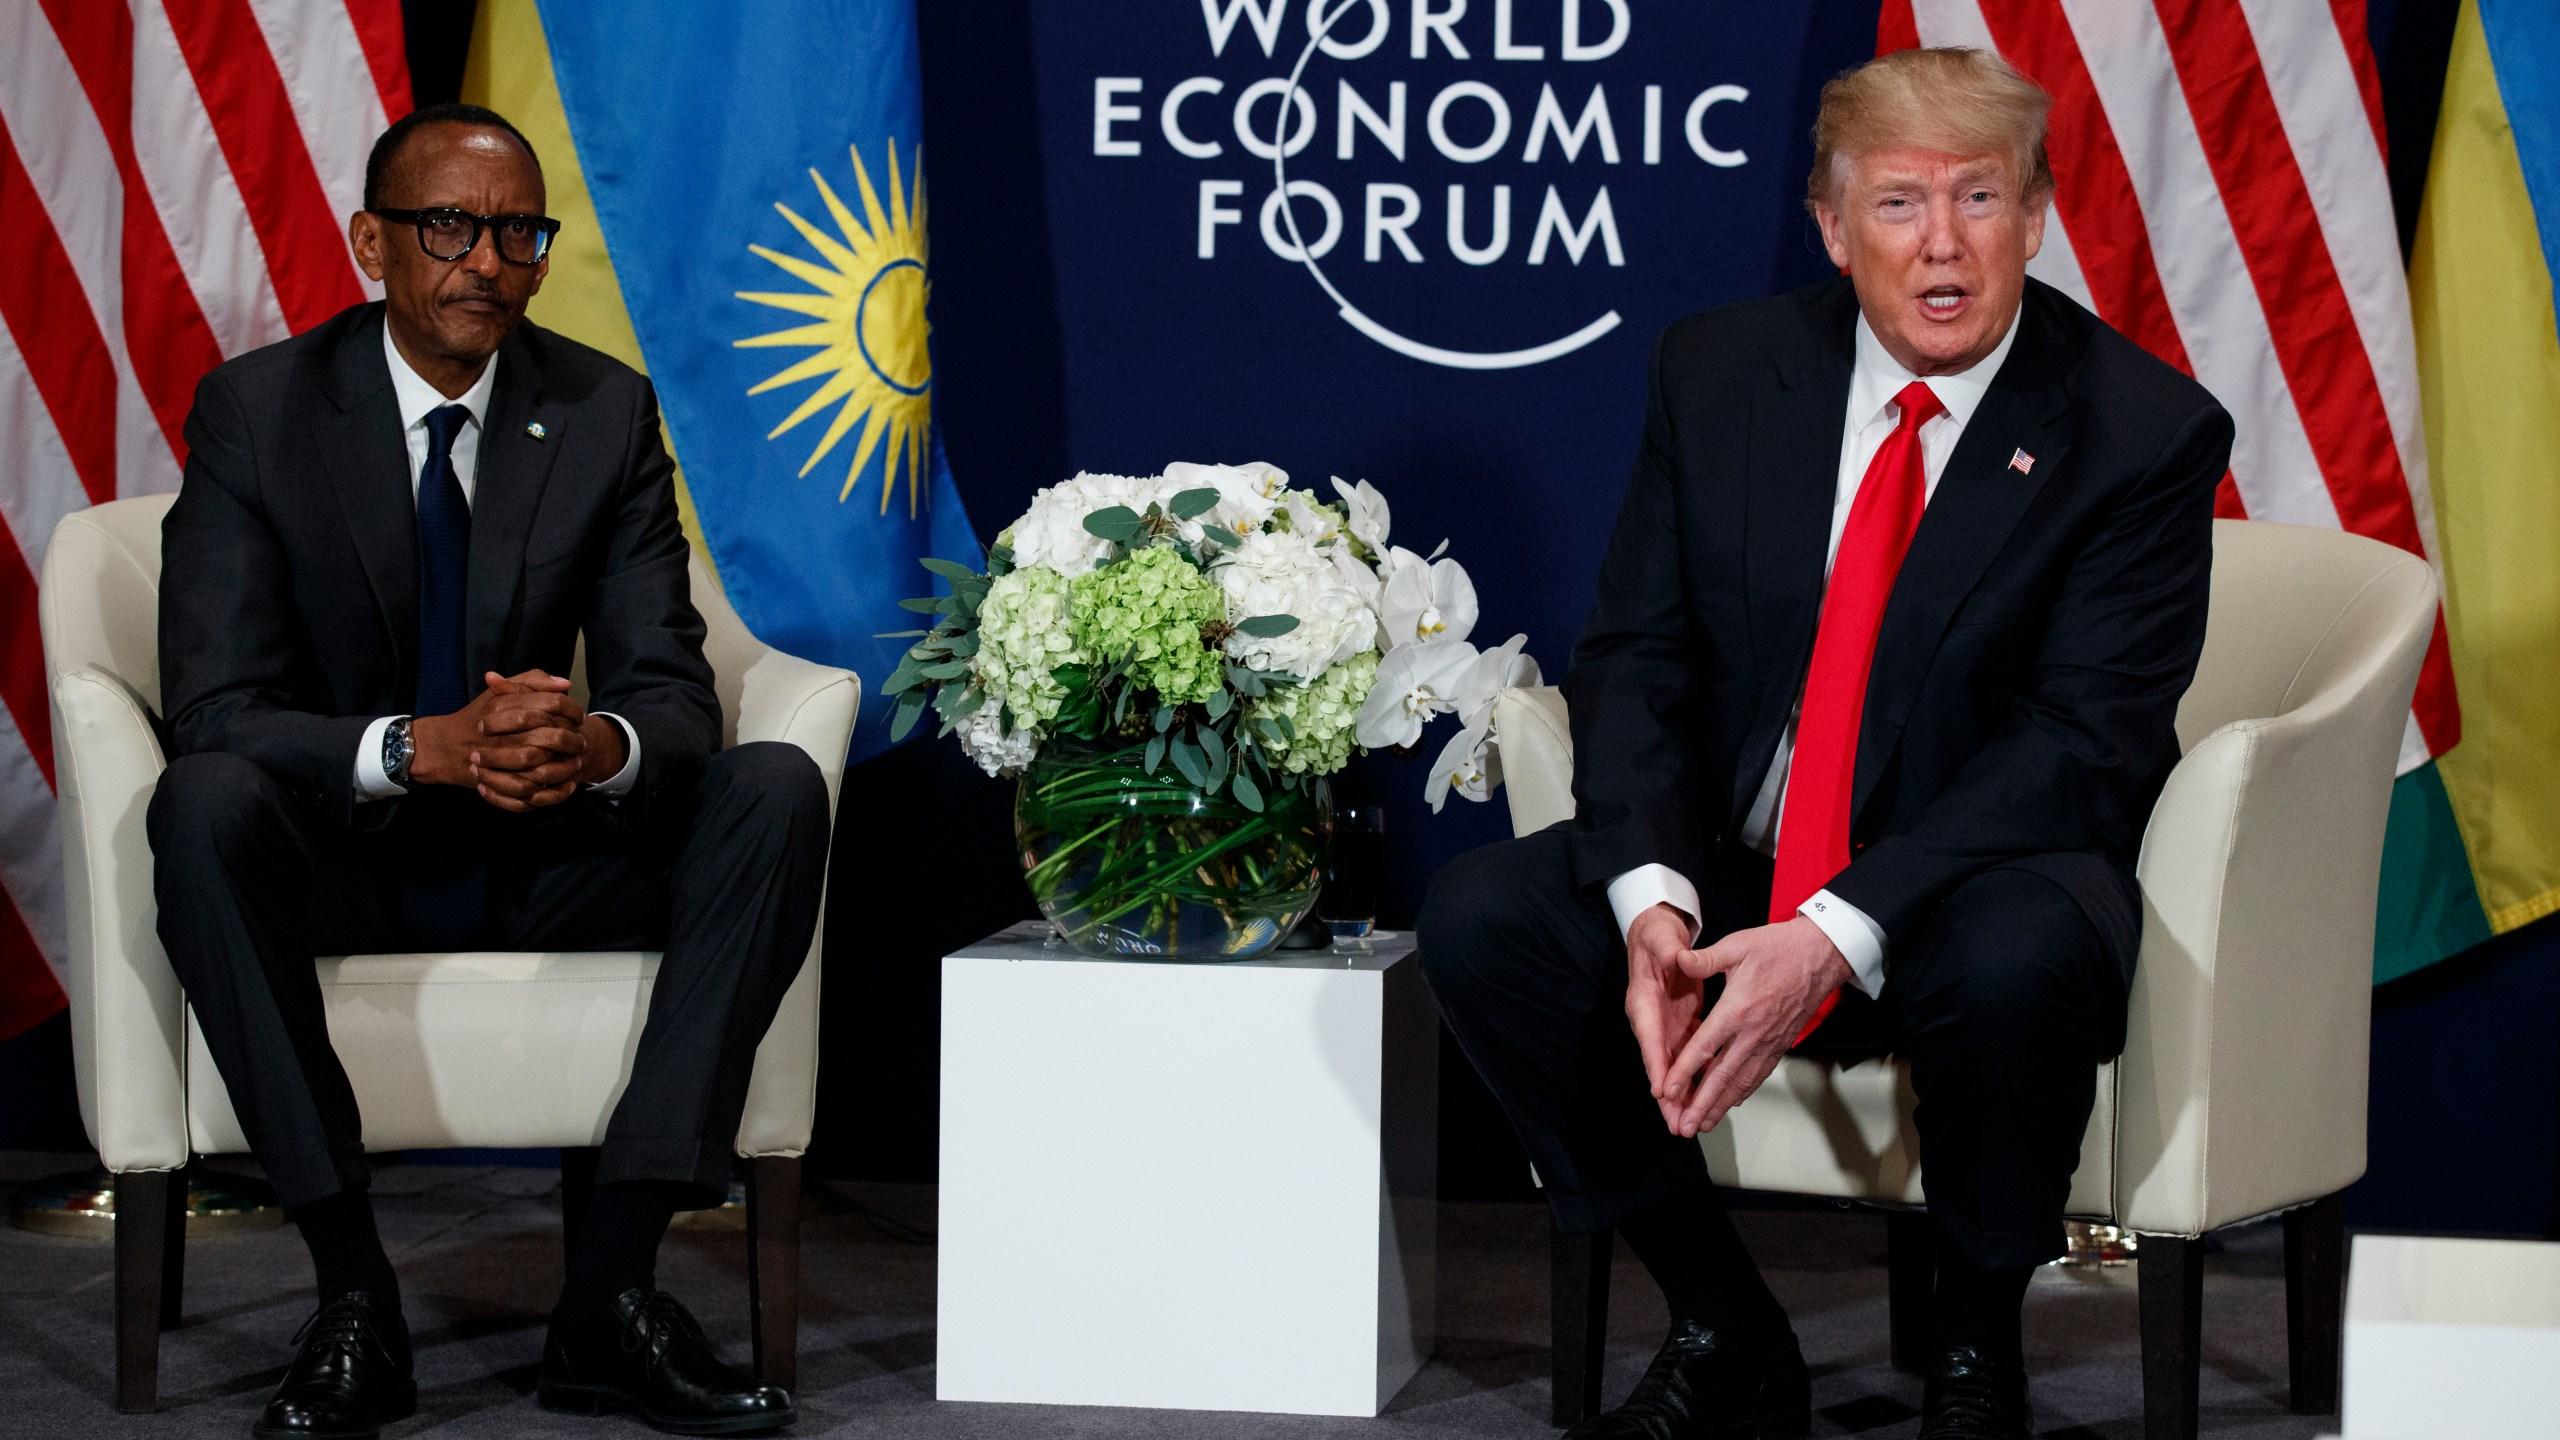 Trump_Davos_36784-159532.jpg44291734